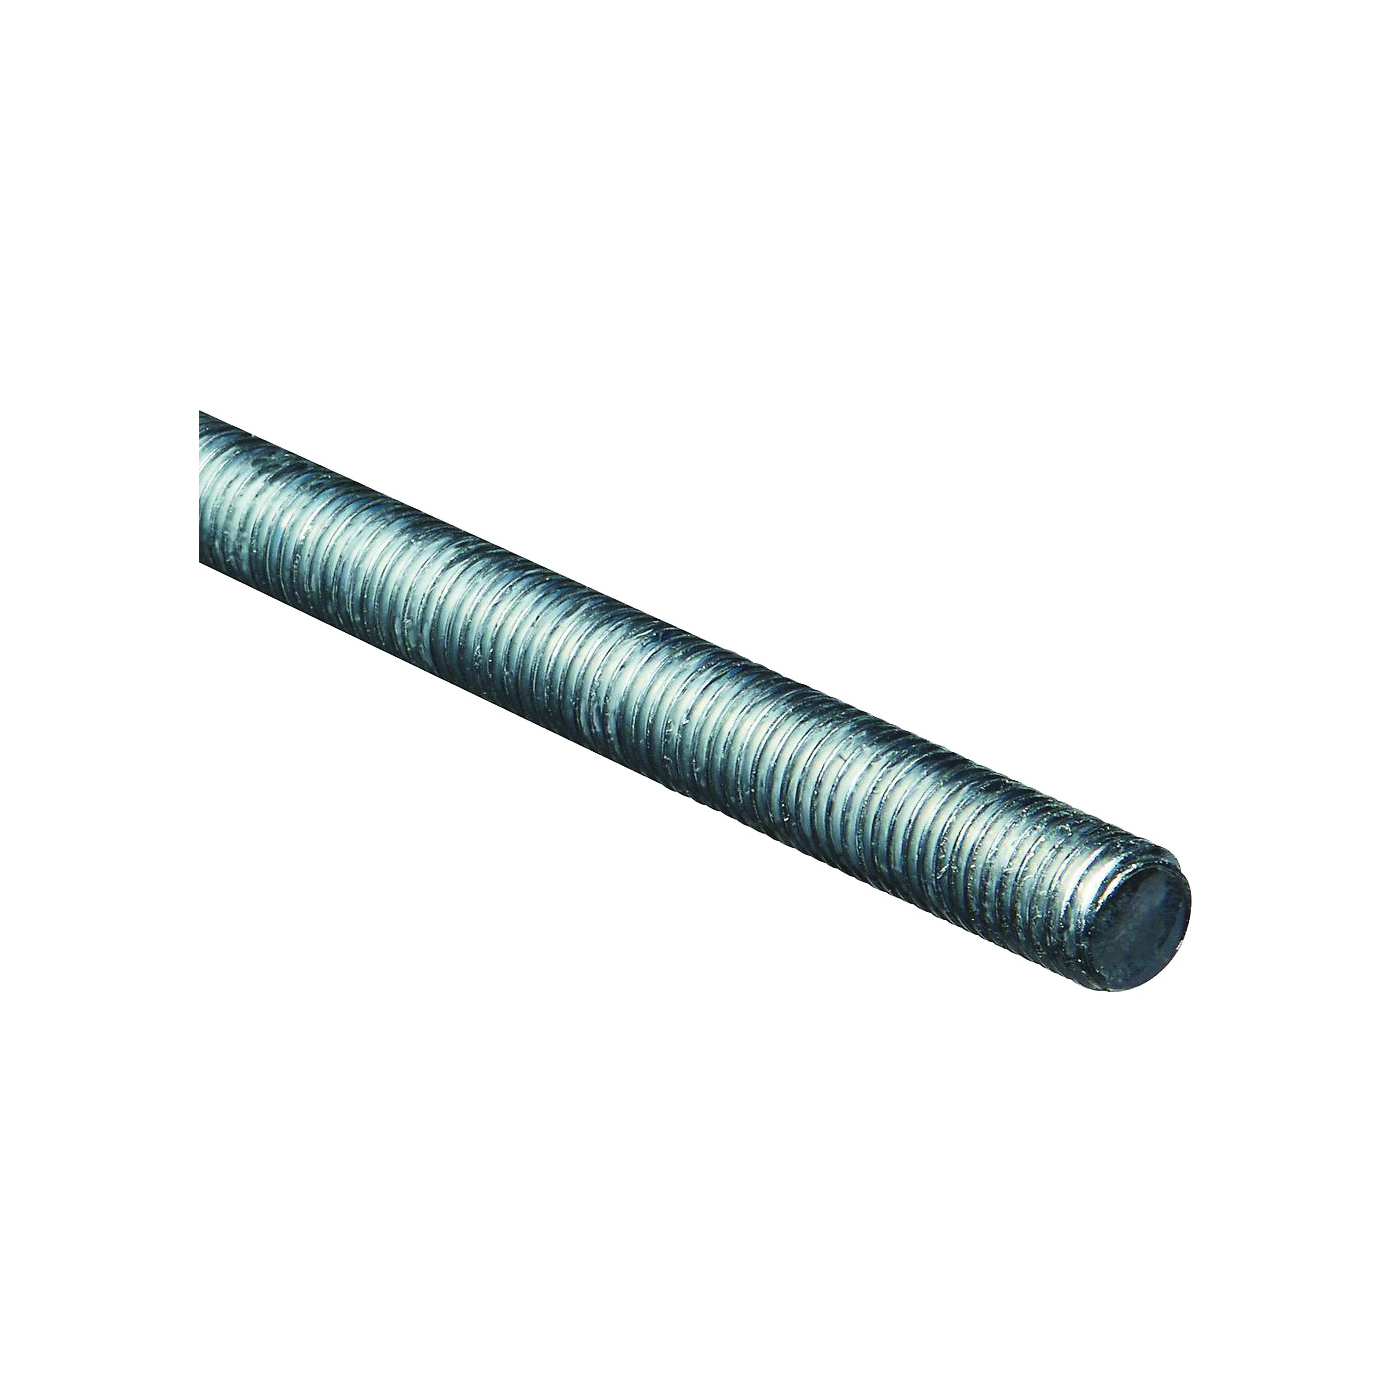 Picture of Stanley Hardware 179549 Threaded Rod, 5/8-11 Thread, 36 in L, A Grade, Steel, Zinc, UNC Thread